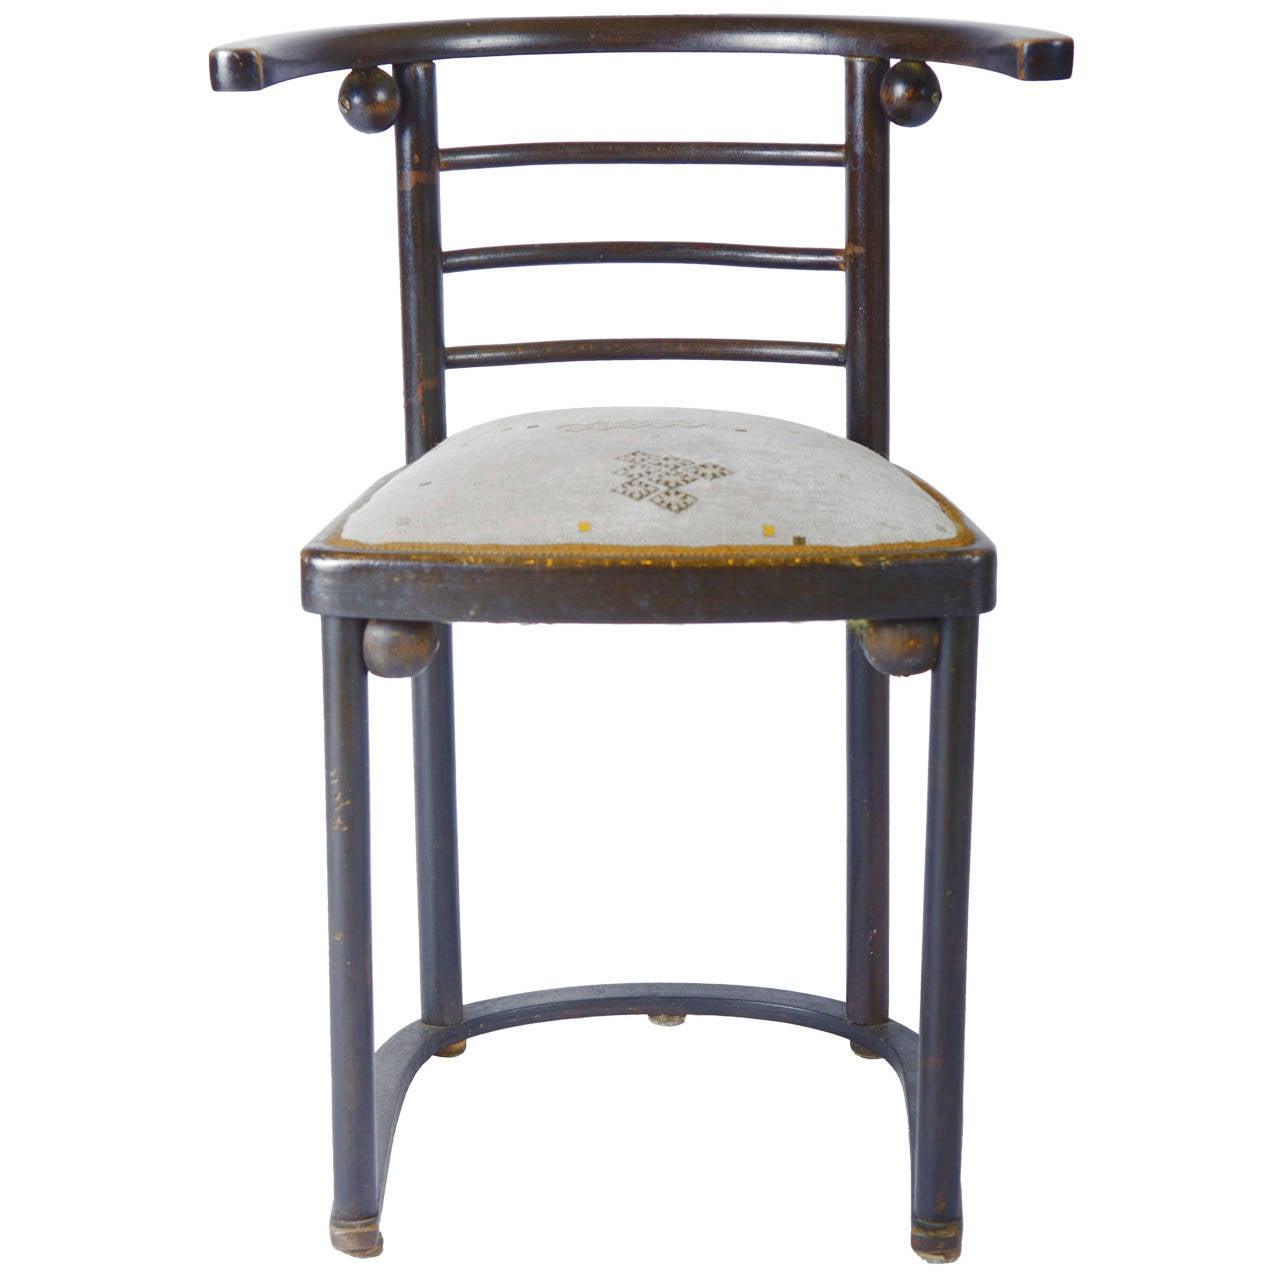 "Kohn Chair Model No. 728 ""Fledermaus"" by Josef Hoffmann"